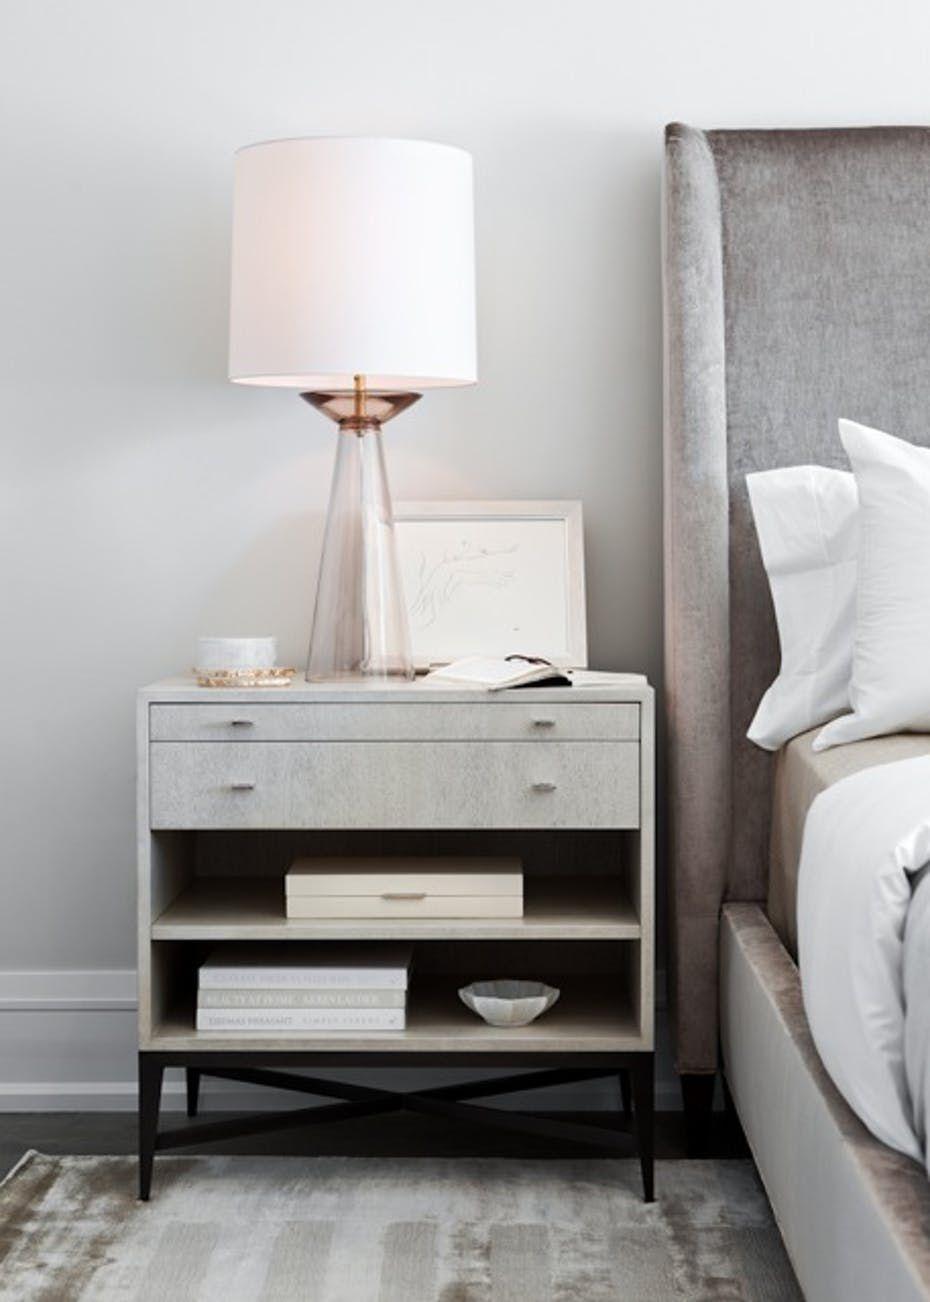 Elizabeth metcalfe interiors design inc portfolio interiors styles.jpeg?ixlib=rails 1.1